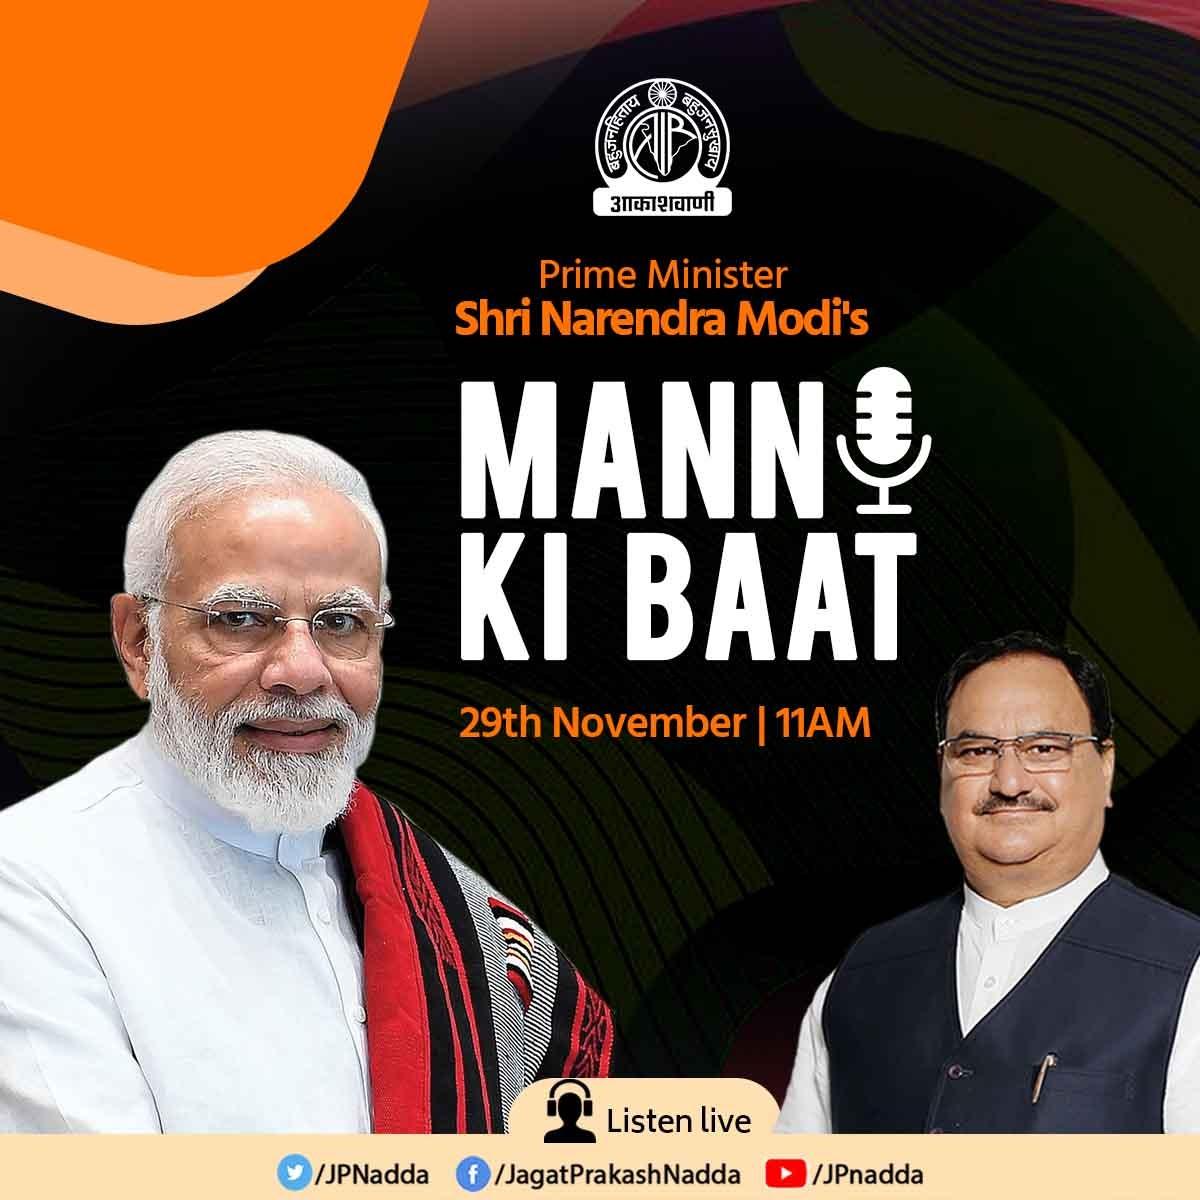 Please listen to honorable Prime Minister Shri @narendramodi jis #MannKiBaat tomorrow at 11:00AM.